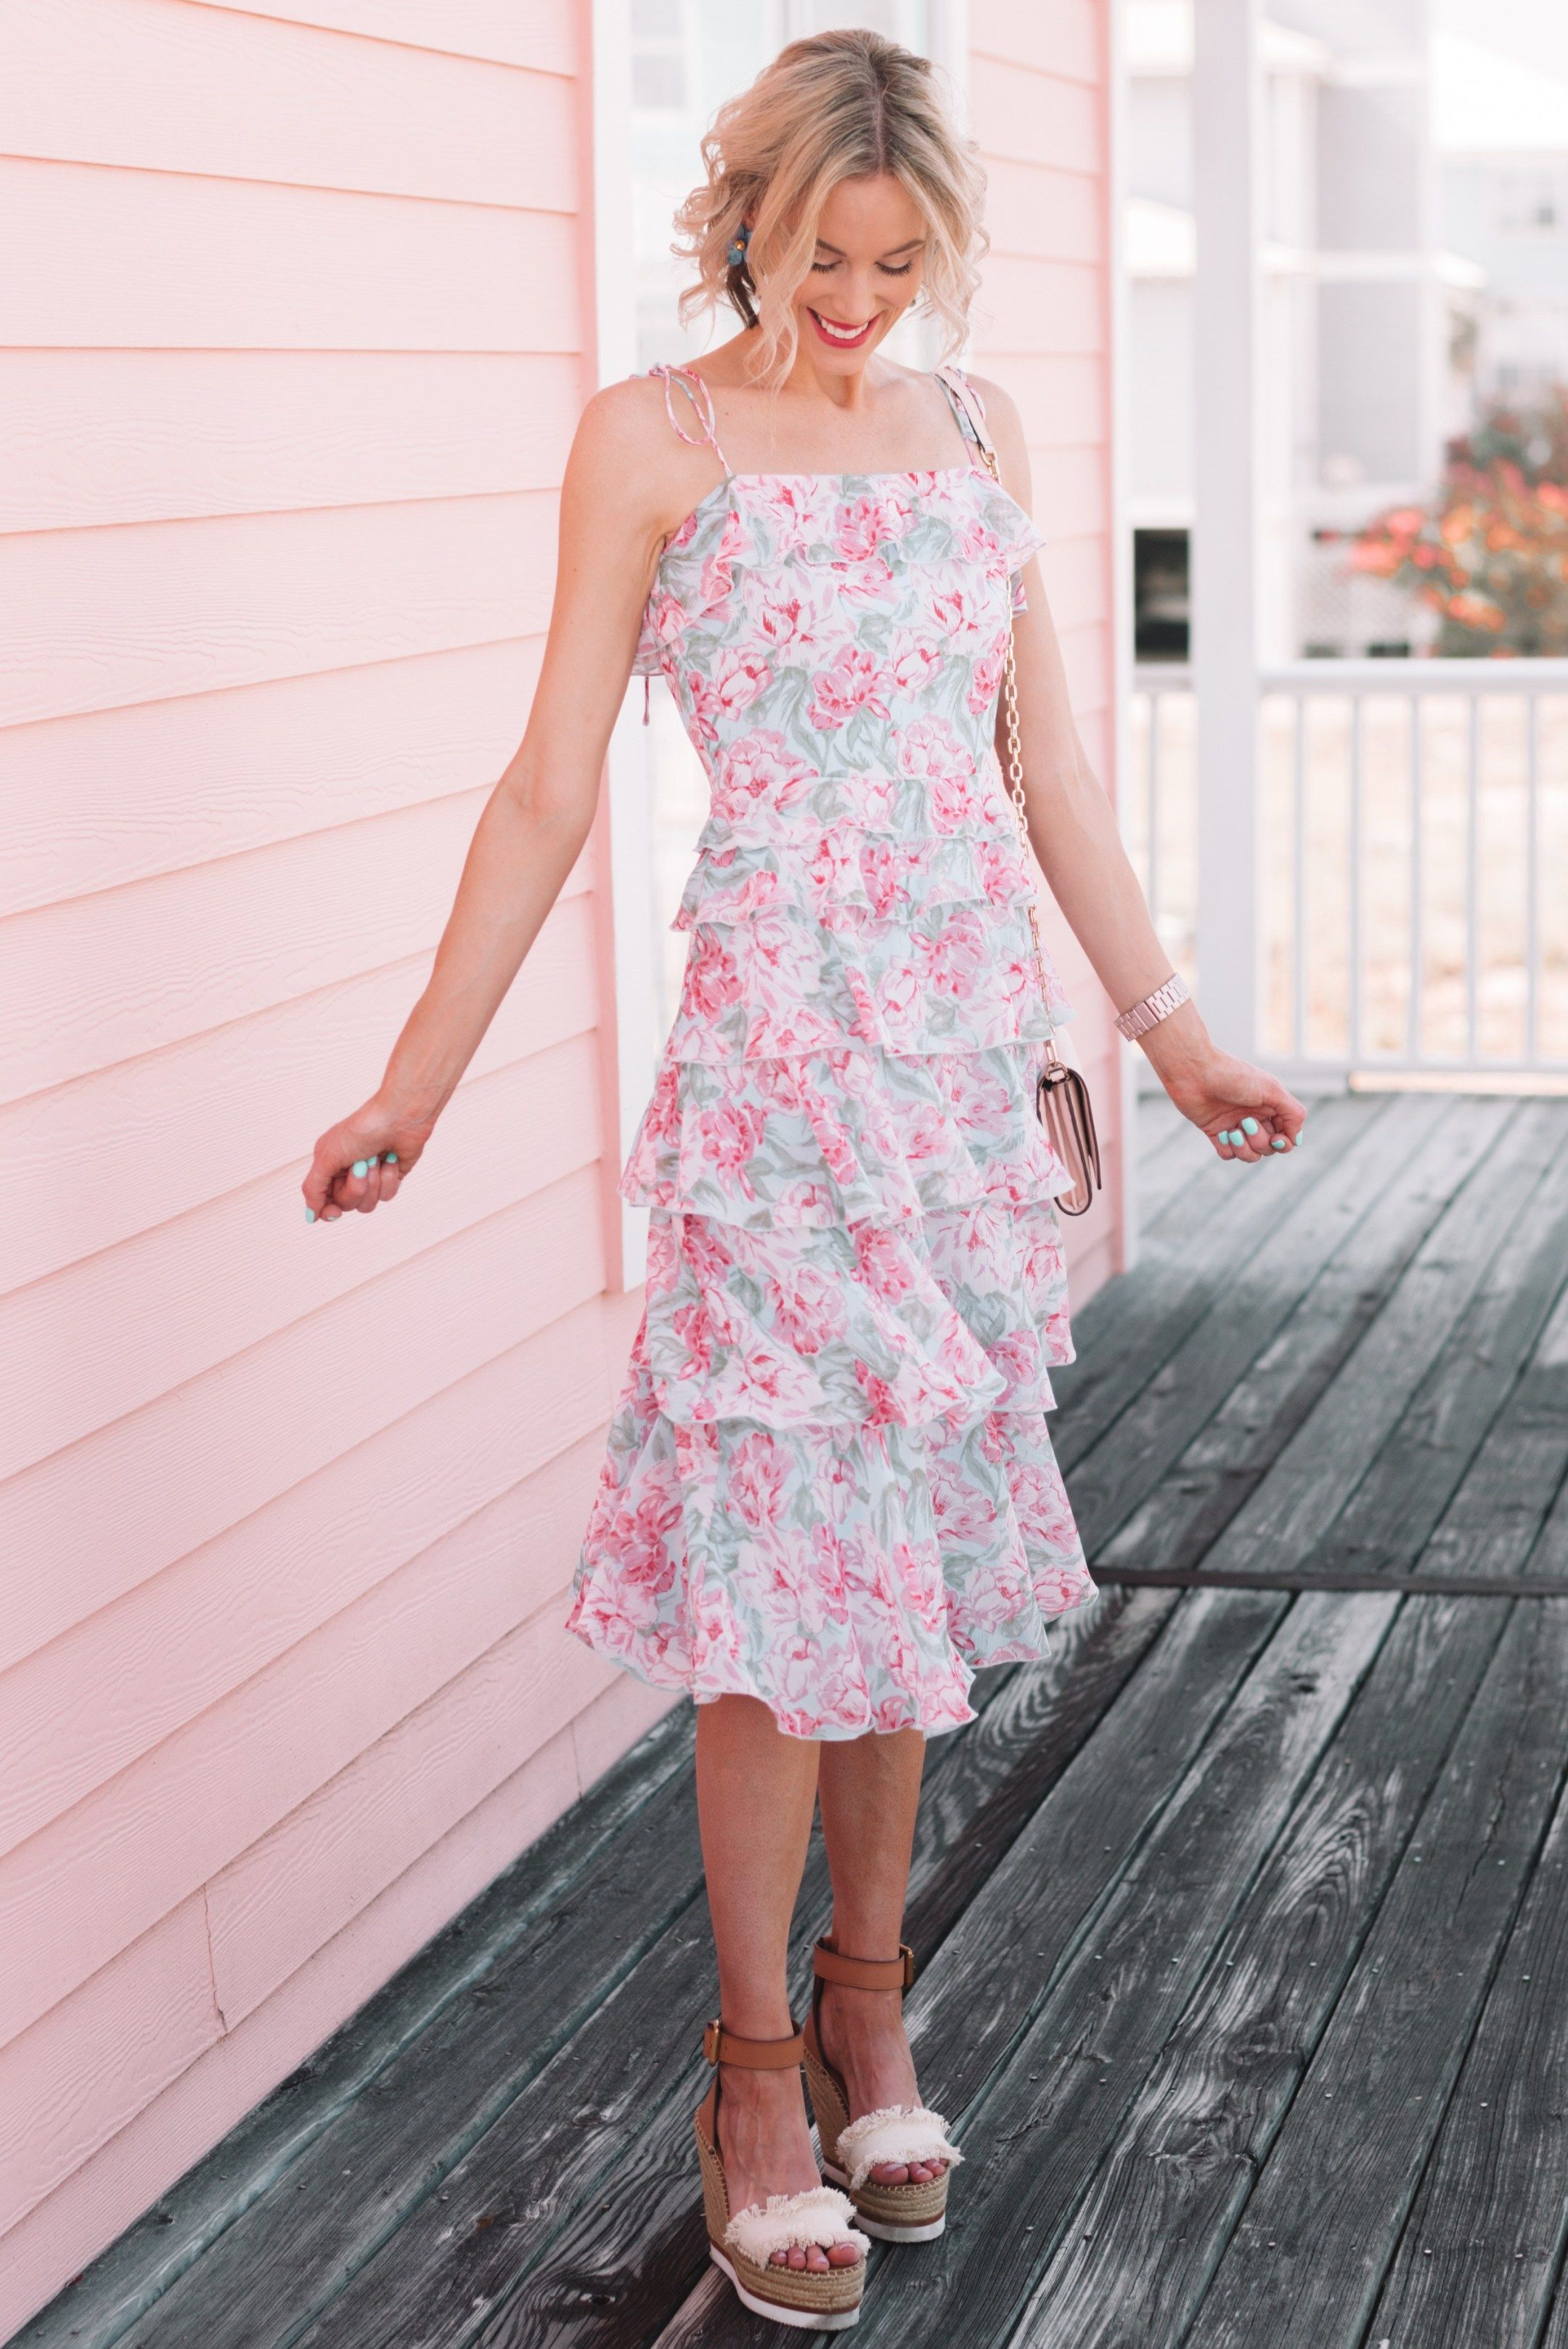 What To Wear To A Summer Wedding Summer Wedding Guest Dress Ideas Straight A Style Wedding Guest Dress Wedding Guest Dress Summer Guest Dresses [ 3235 x 2160 Pixel ]